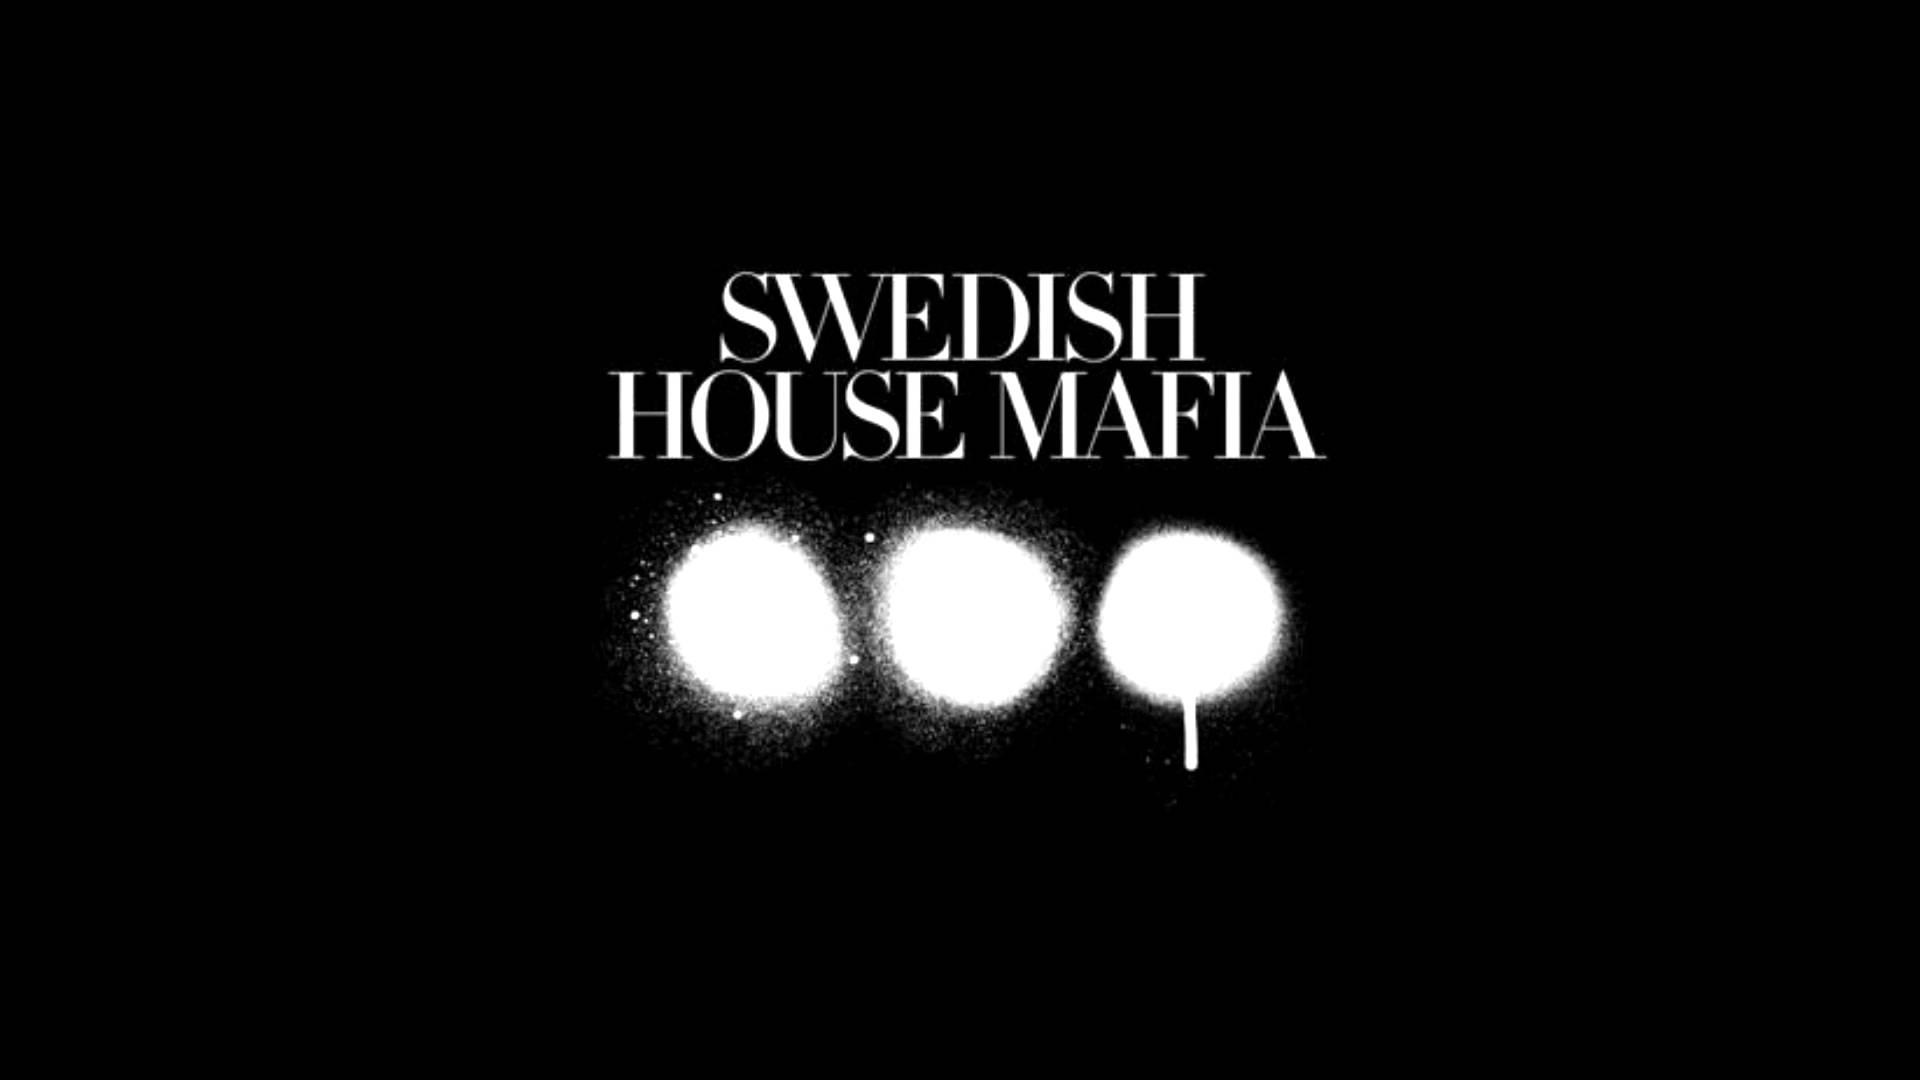 coldplay - every teardrop is a waterfall (swedish house mafia remix